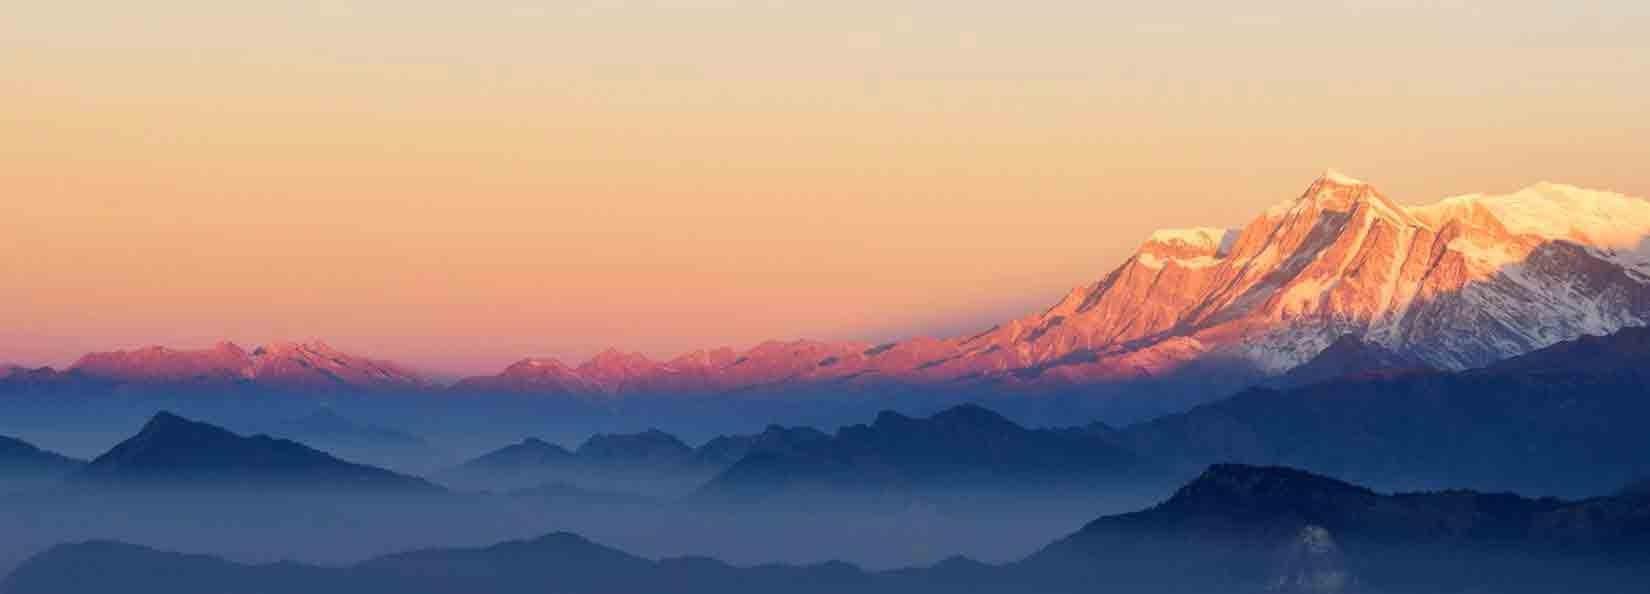 shopinholidays-the-country-of-himalayan